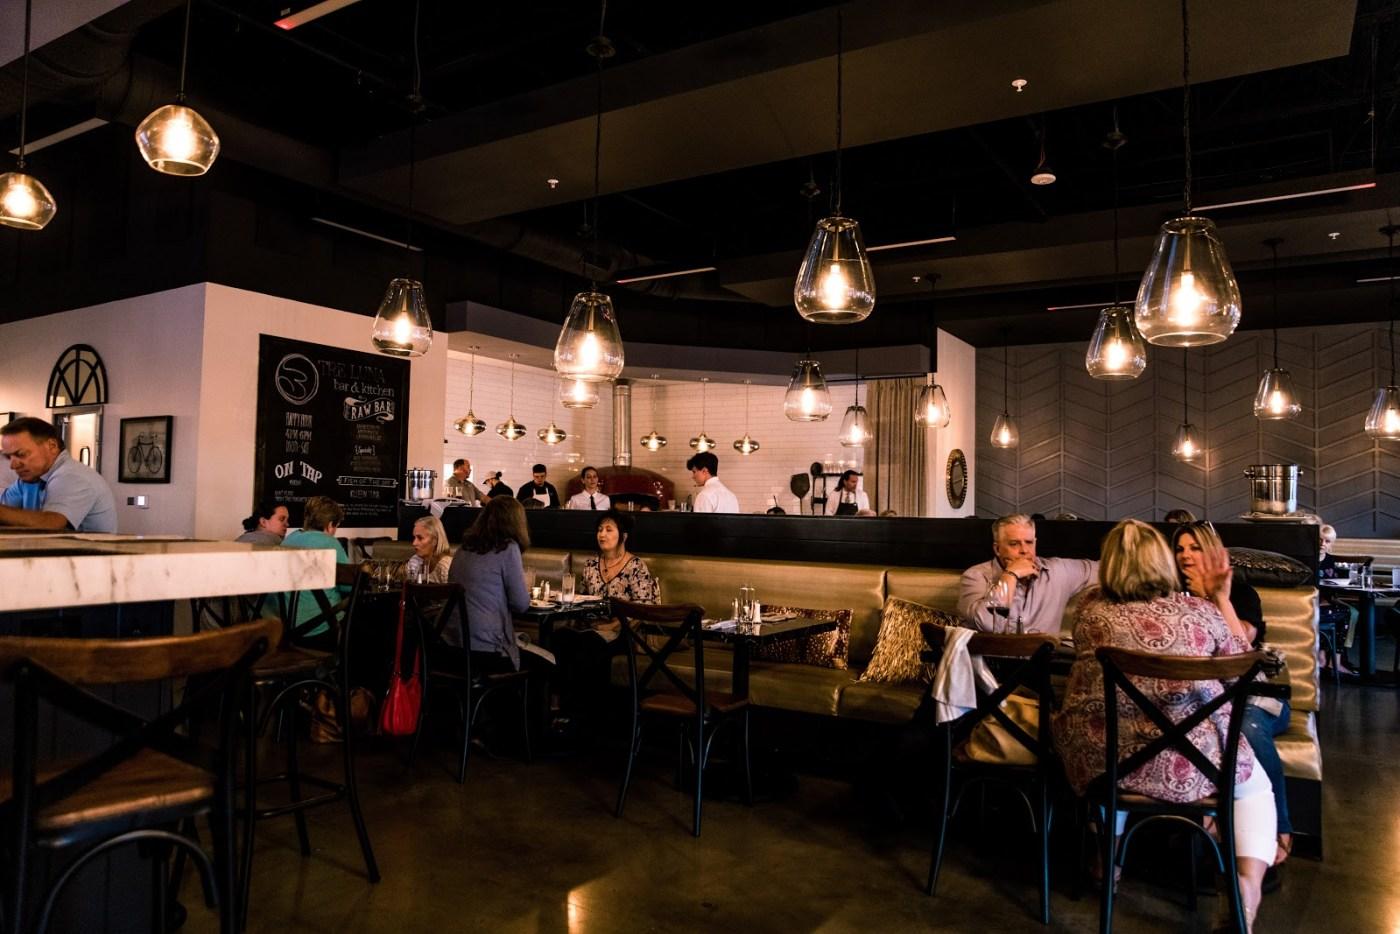 Birmingham, Hoover, Tre Luna Bar and Kitchen, food, football